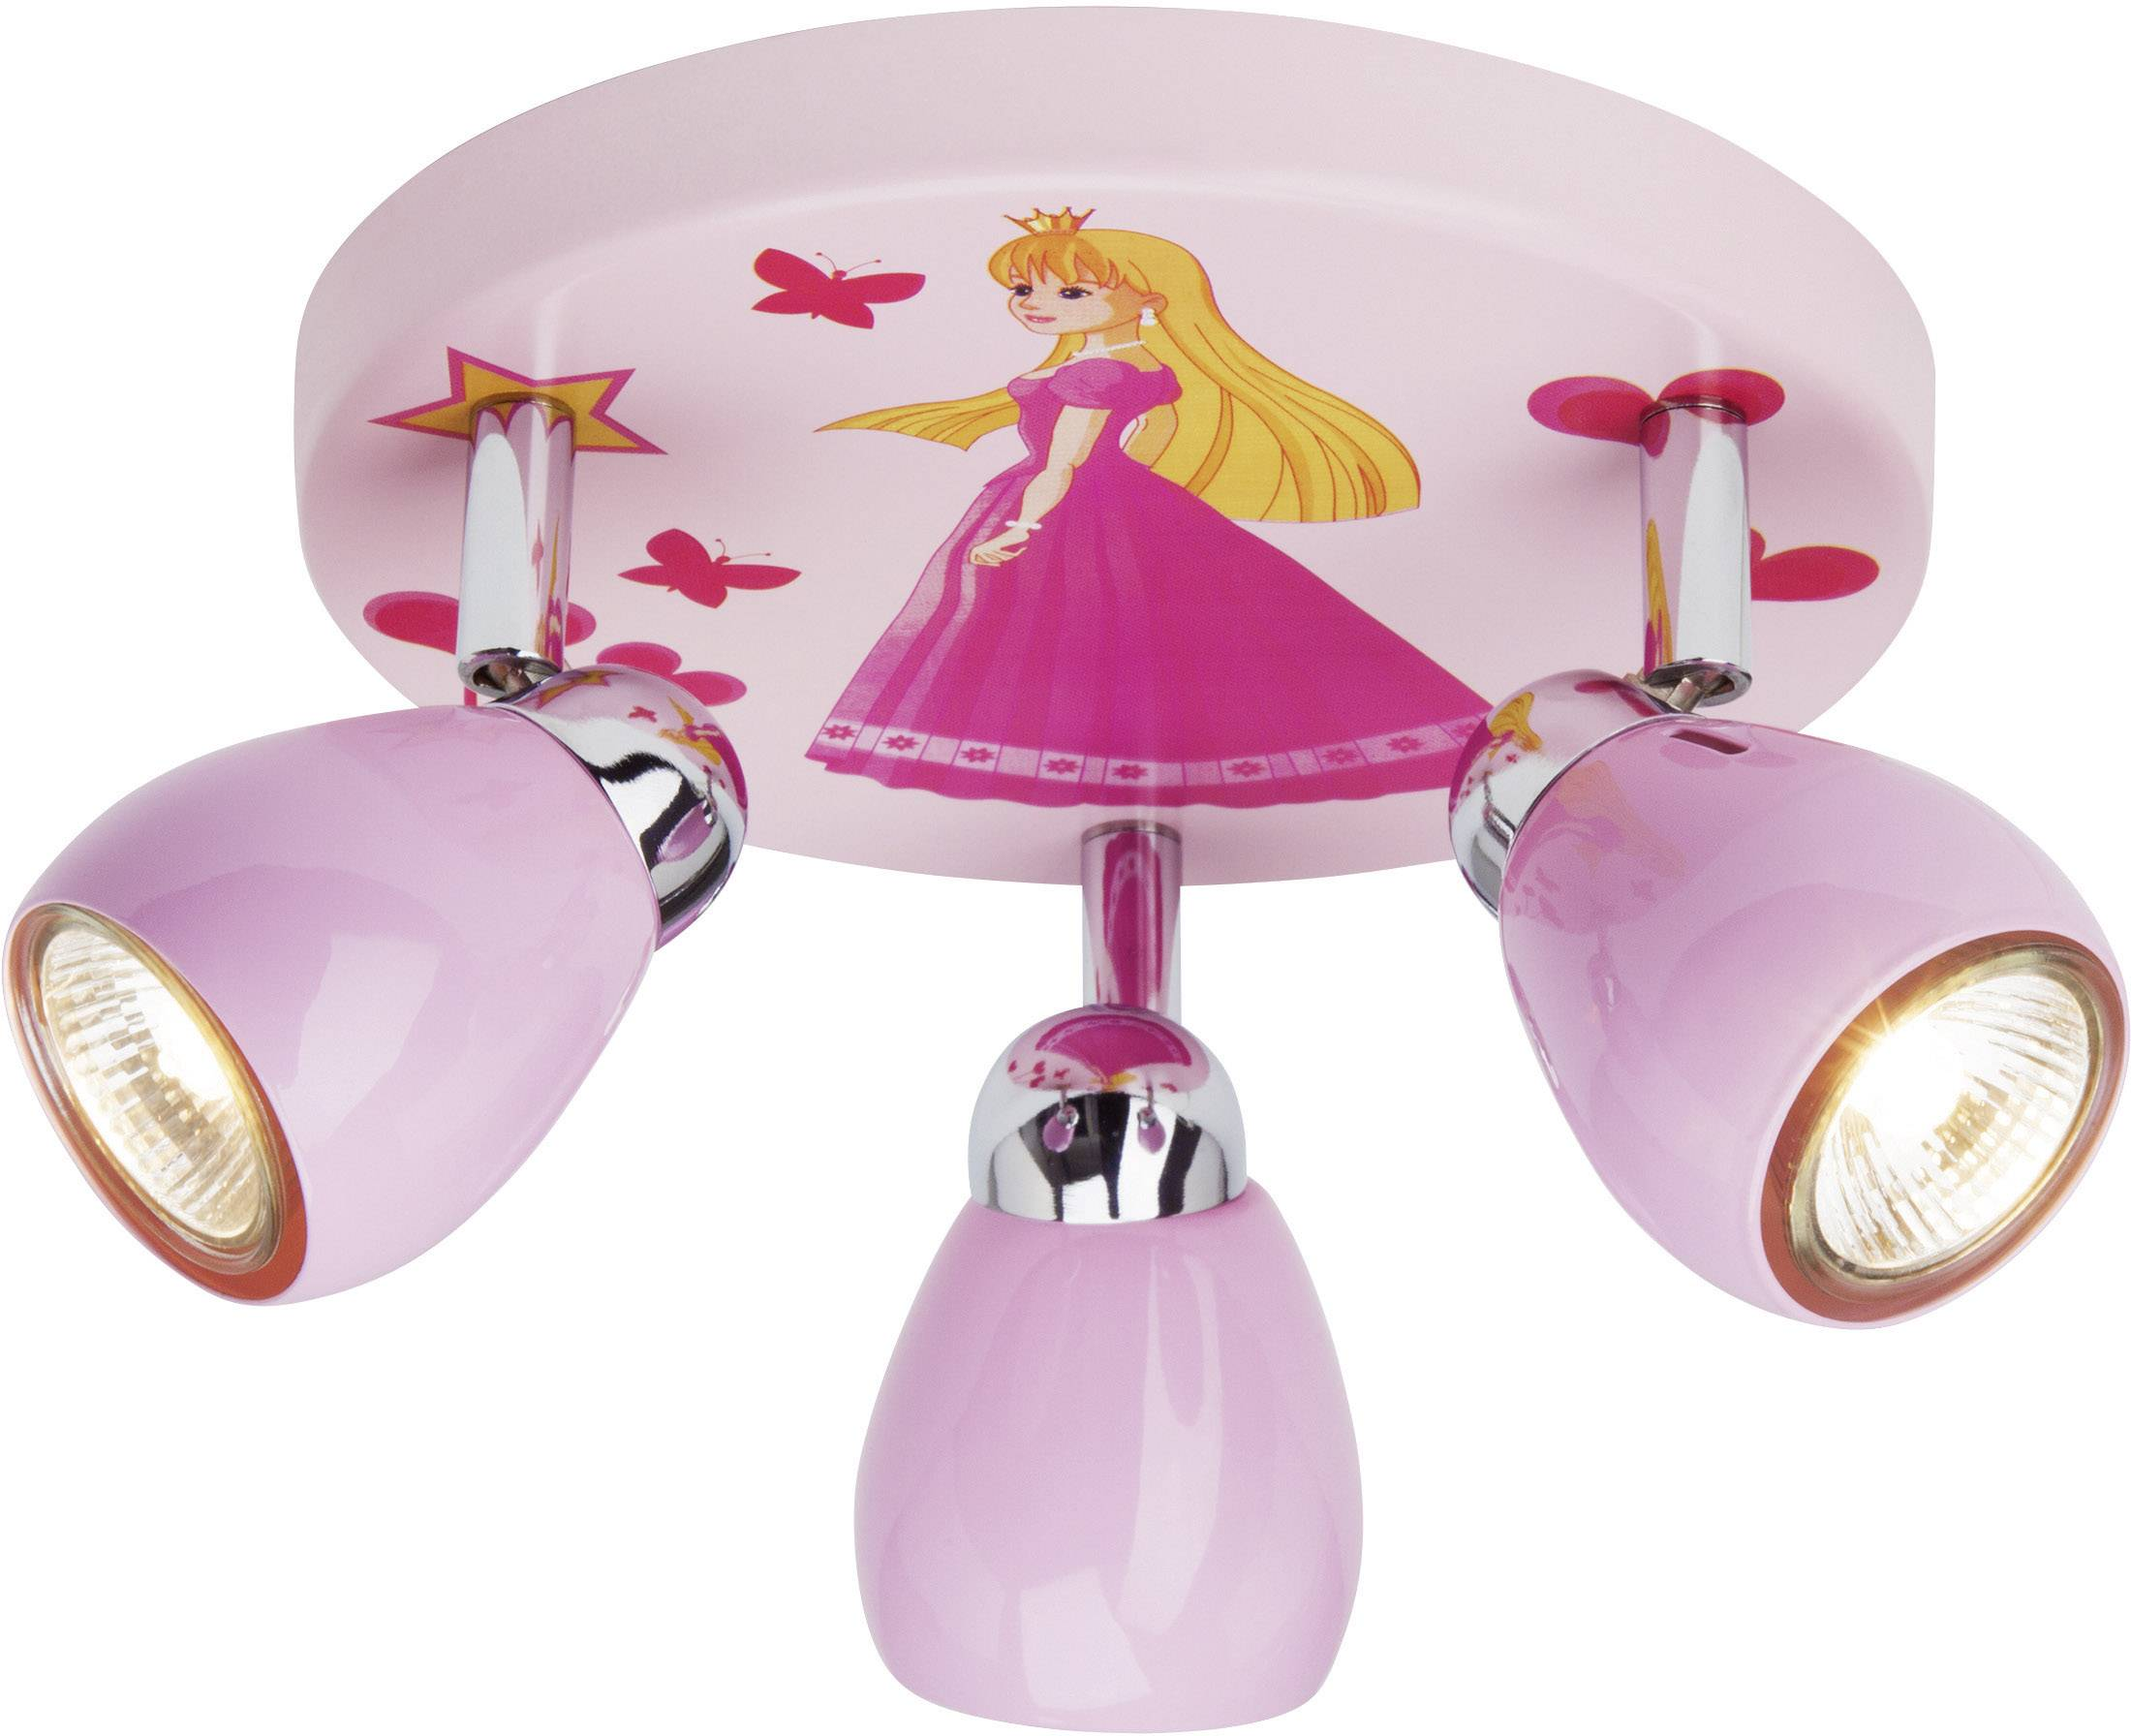 Briljant Lampje Kinderkamer : Plafondlamp halogeen gu10 roze brilliant princeza conrad.nl